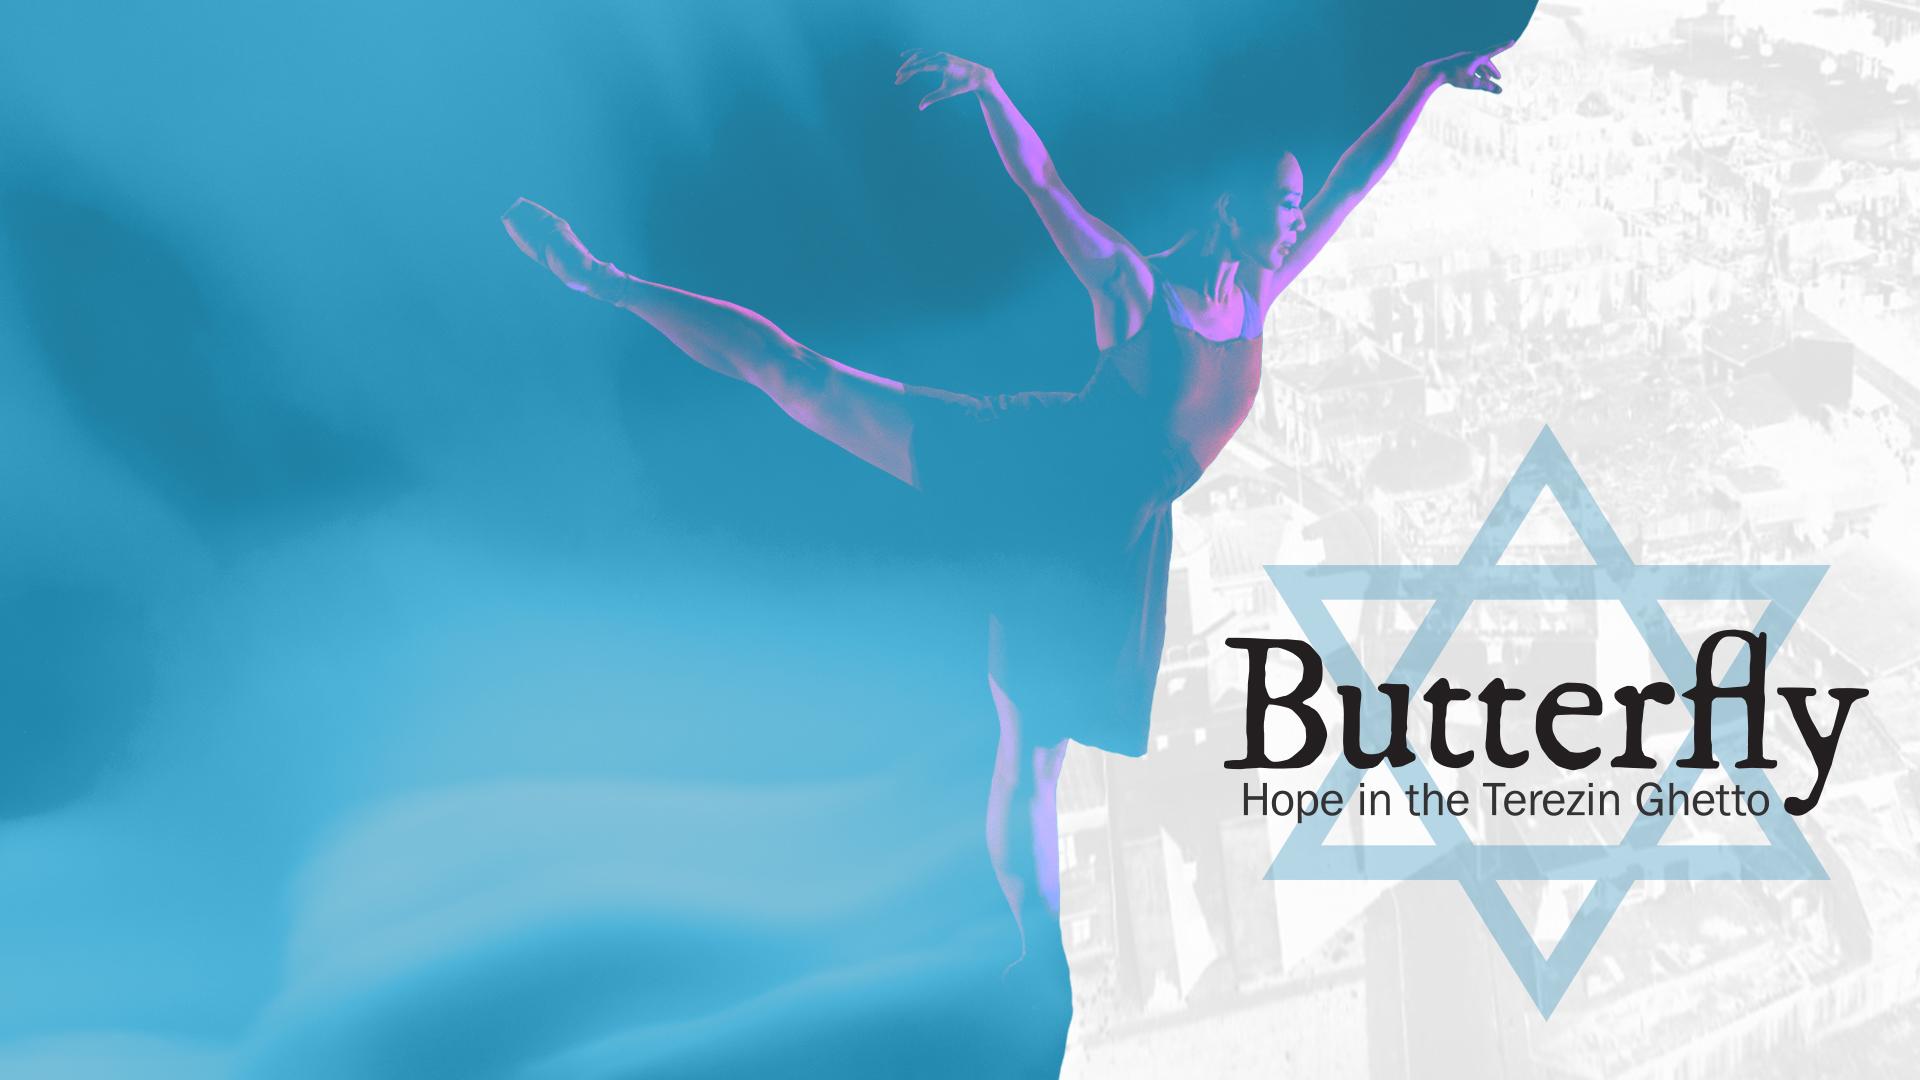 b58-butterfly-graphics-fbevent-1920x1080.jpg